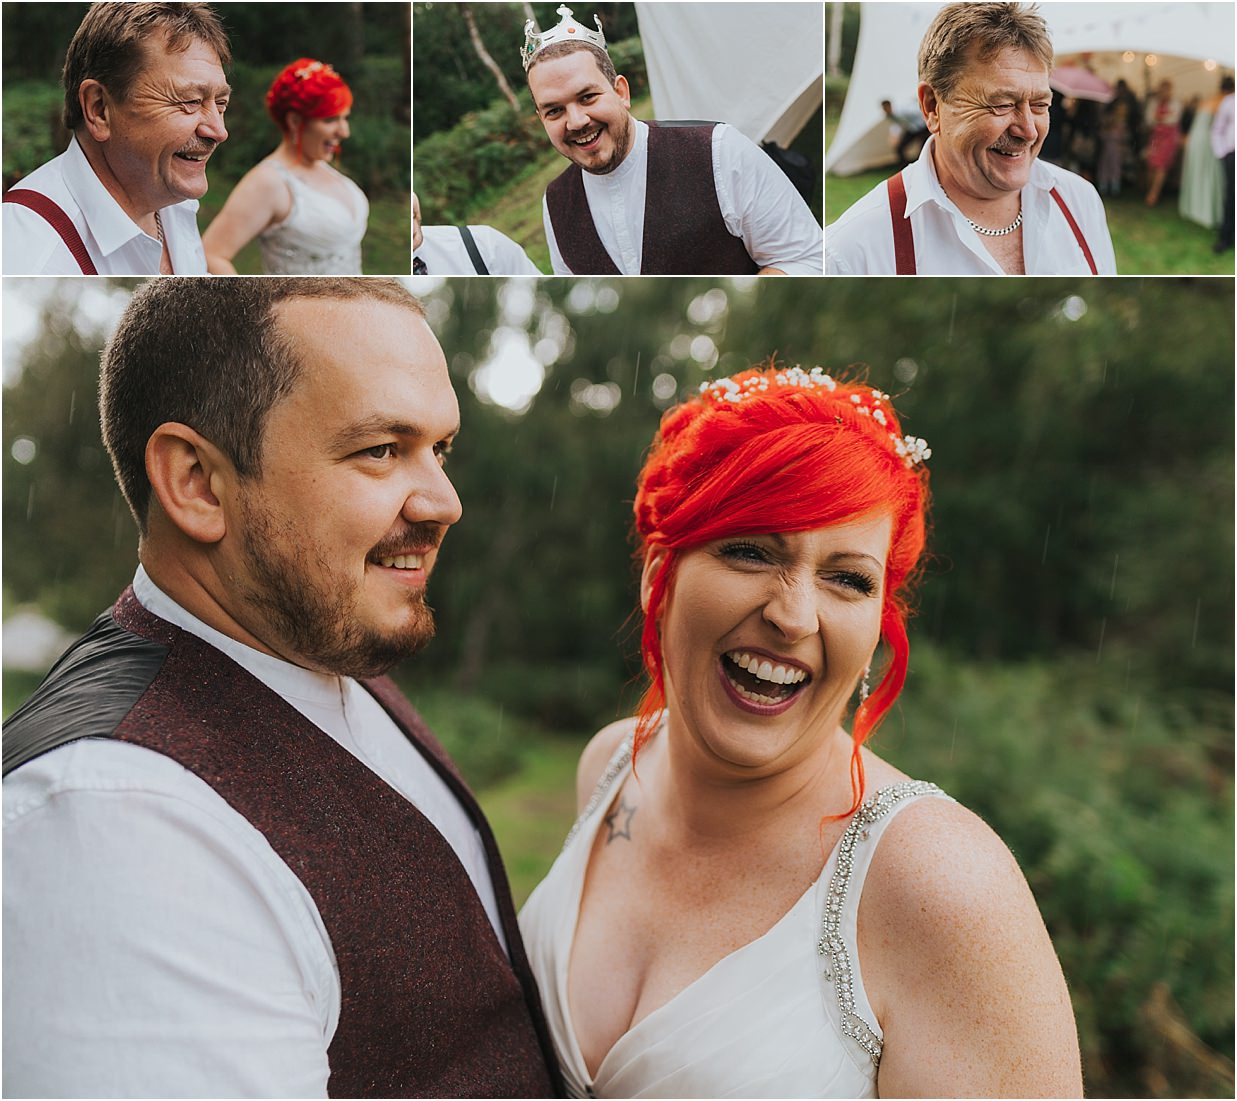 Norfolk Wedding Photograhy Bradmoor Woods Kings Lynn 1065 - Annan // Norfolk Wedding Photographer